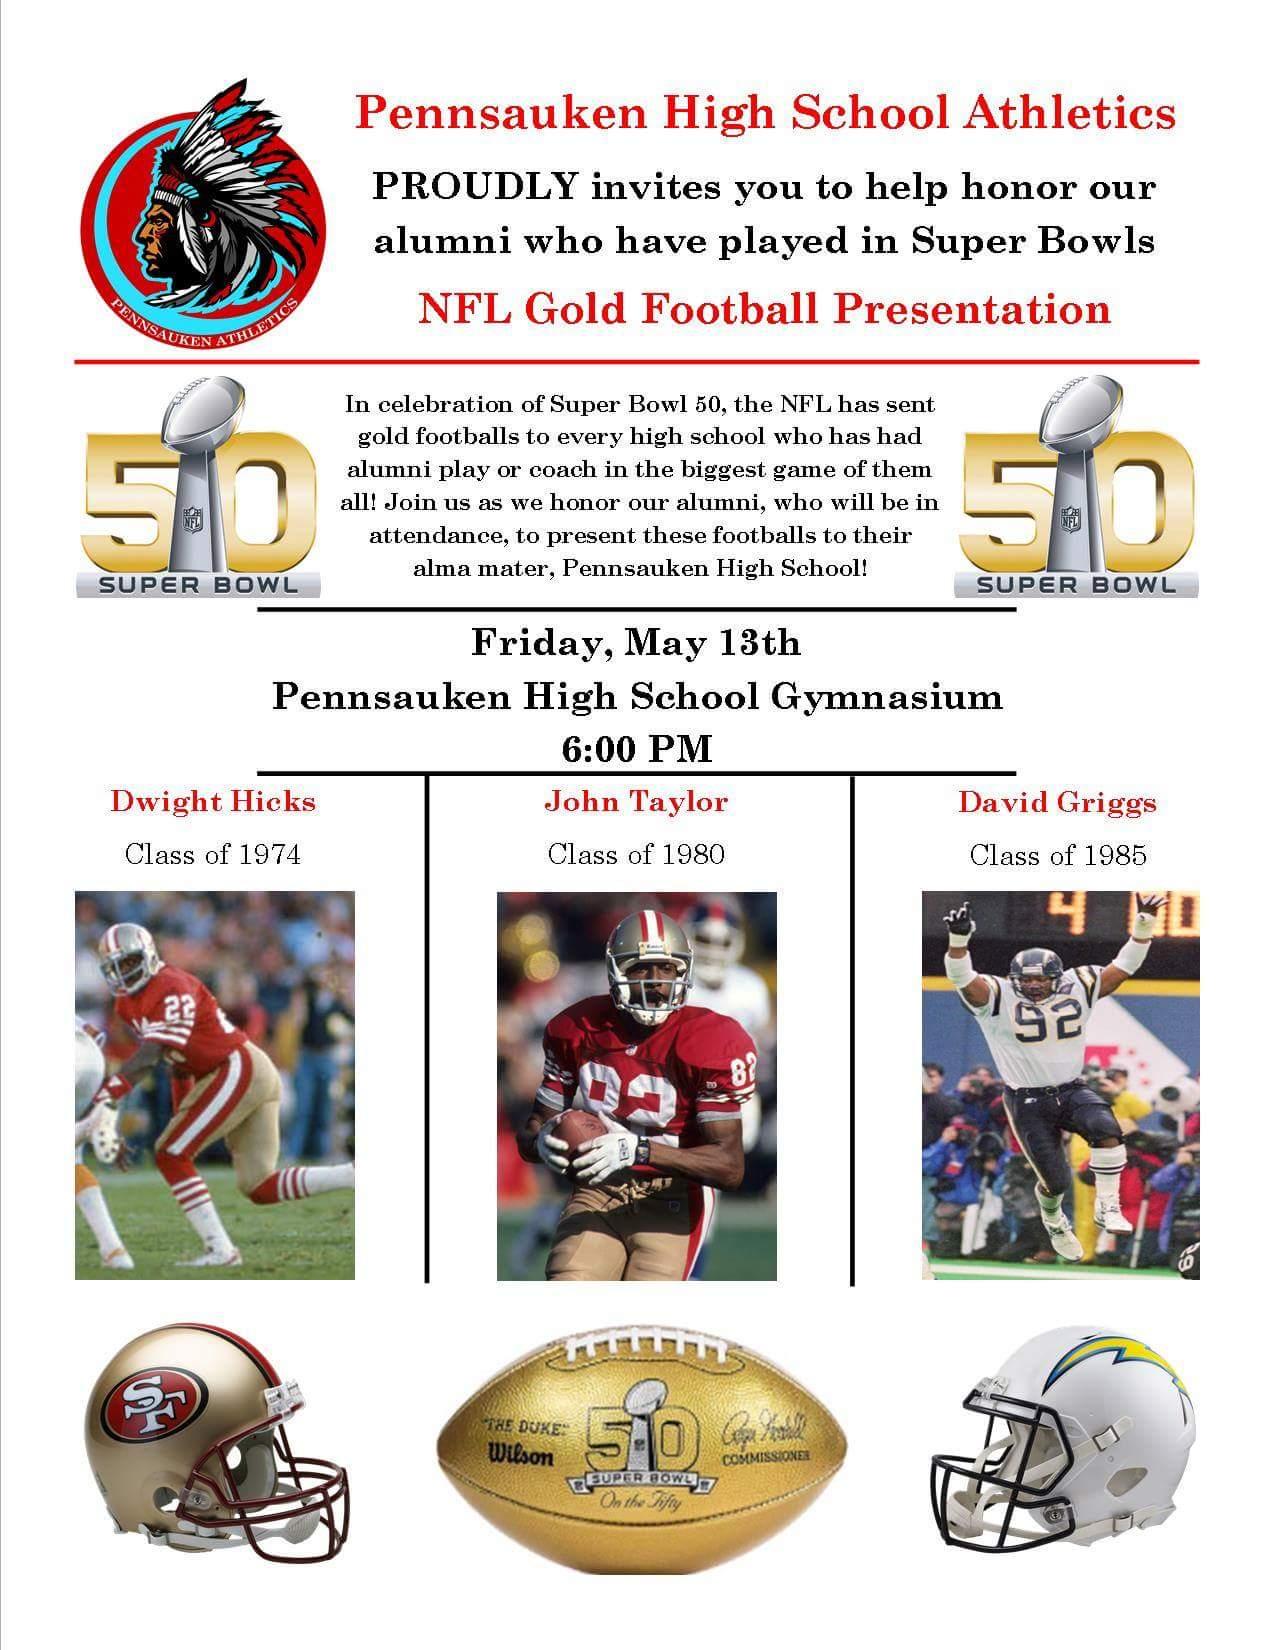 Pennsauken High NFL Gold Football Presentation and Alumni Celebration